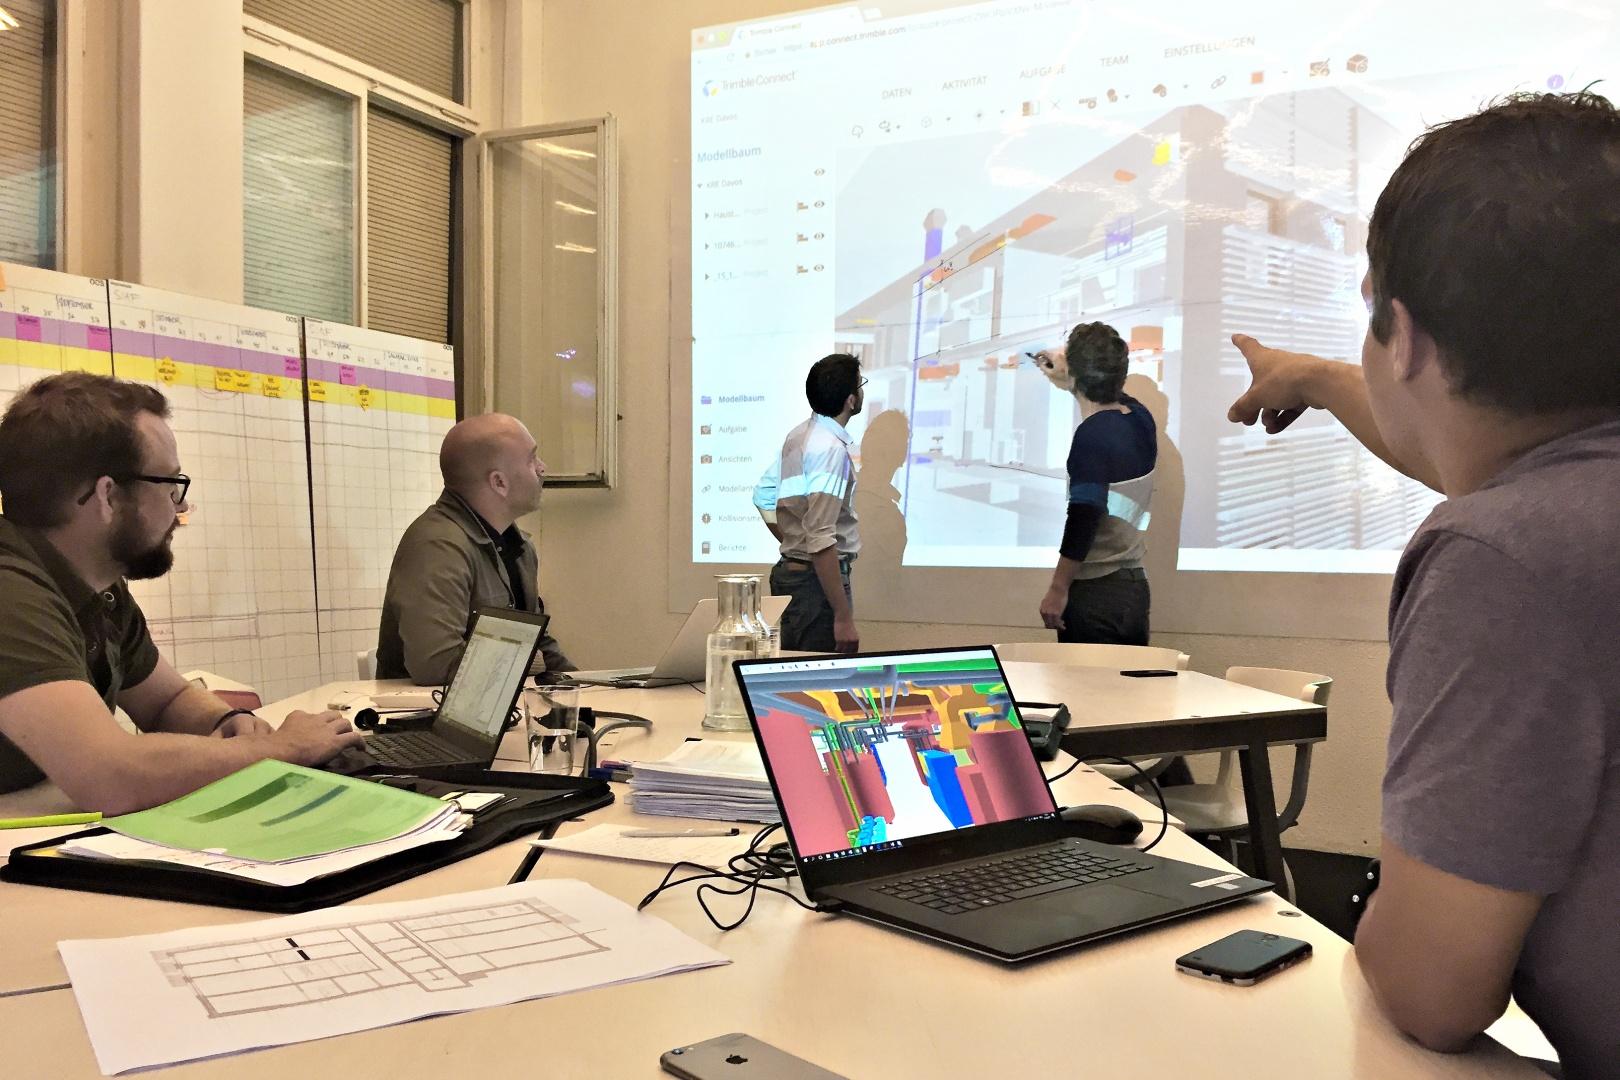 Koordinationssitzung mit digitalem Bauwerksmodell © OOS AG